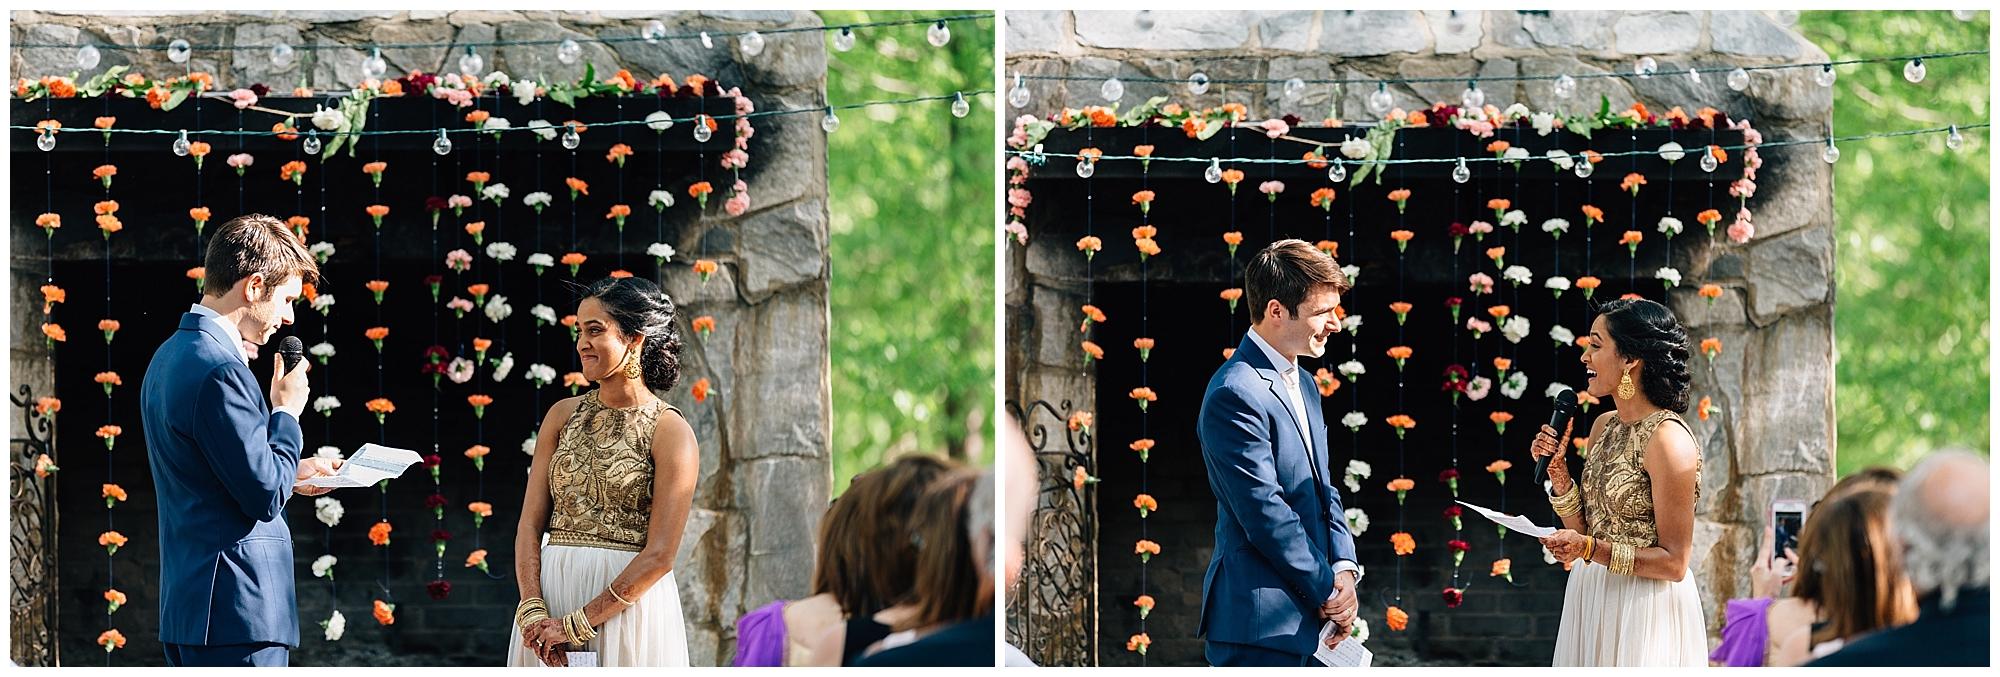 Indian-Wedding-Photographer-Raleigh-82.jpg